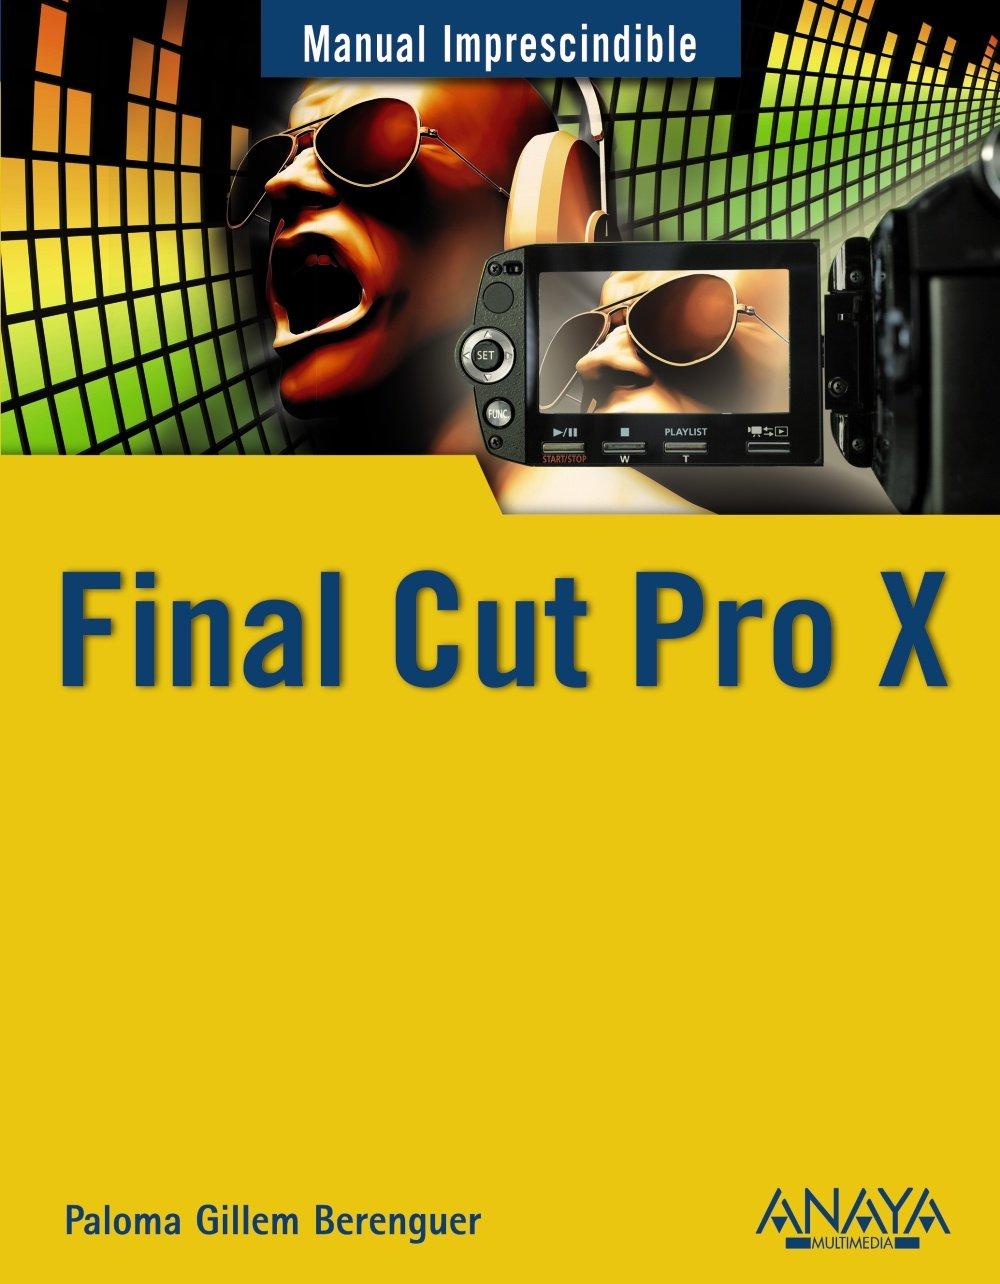 Final Cut Pro X (Manual Imprescindible / Essential Manual) (Spanish  Edition): Paloma Guillem Berenguer: 9788441530515: Amazon.com: Books